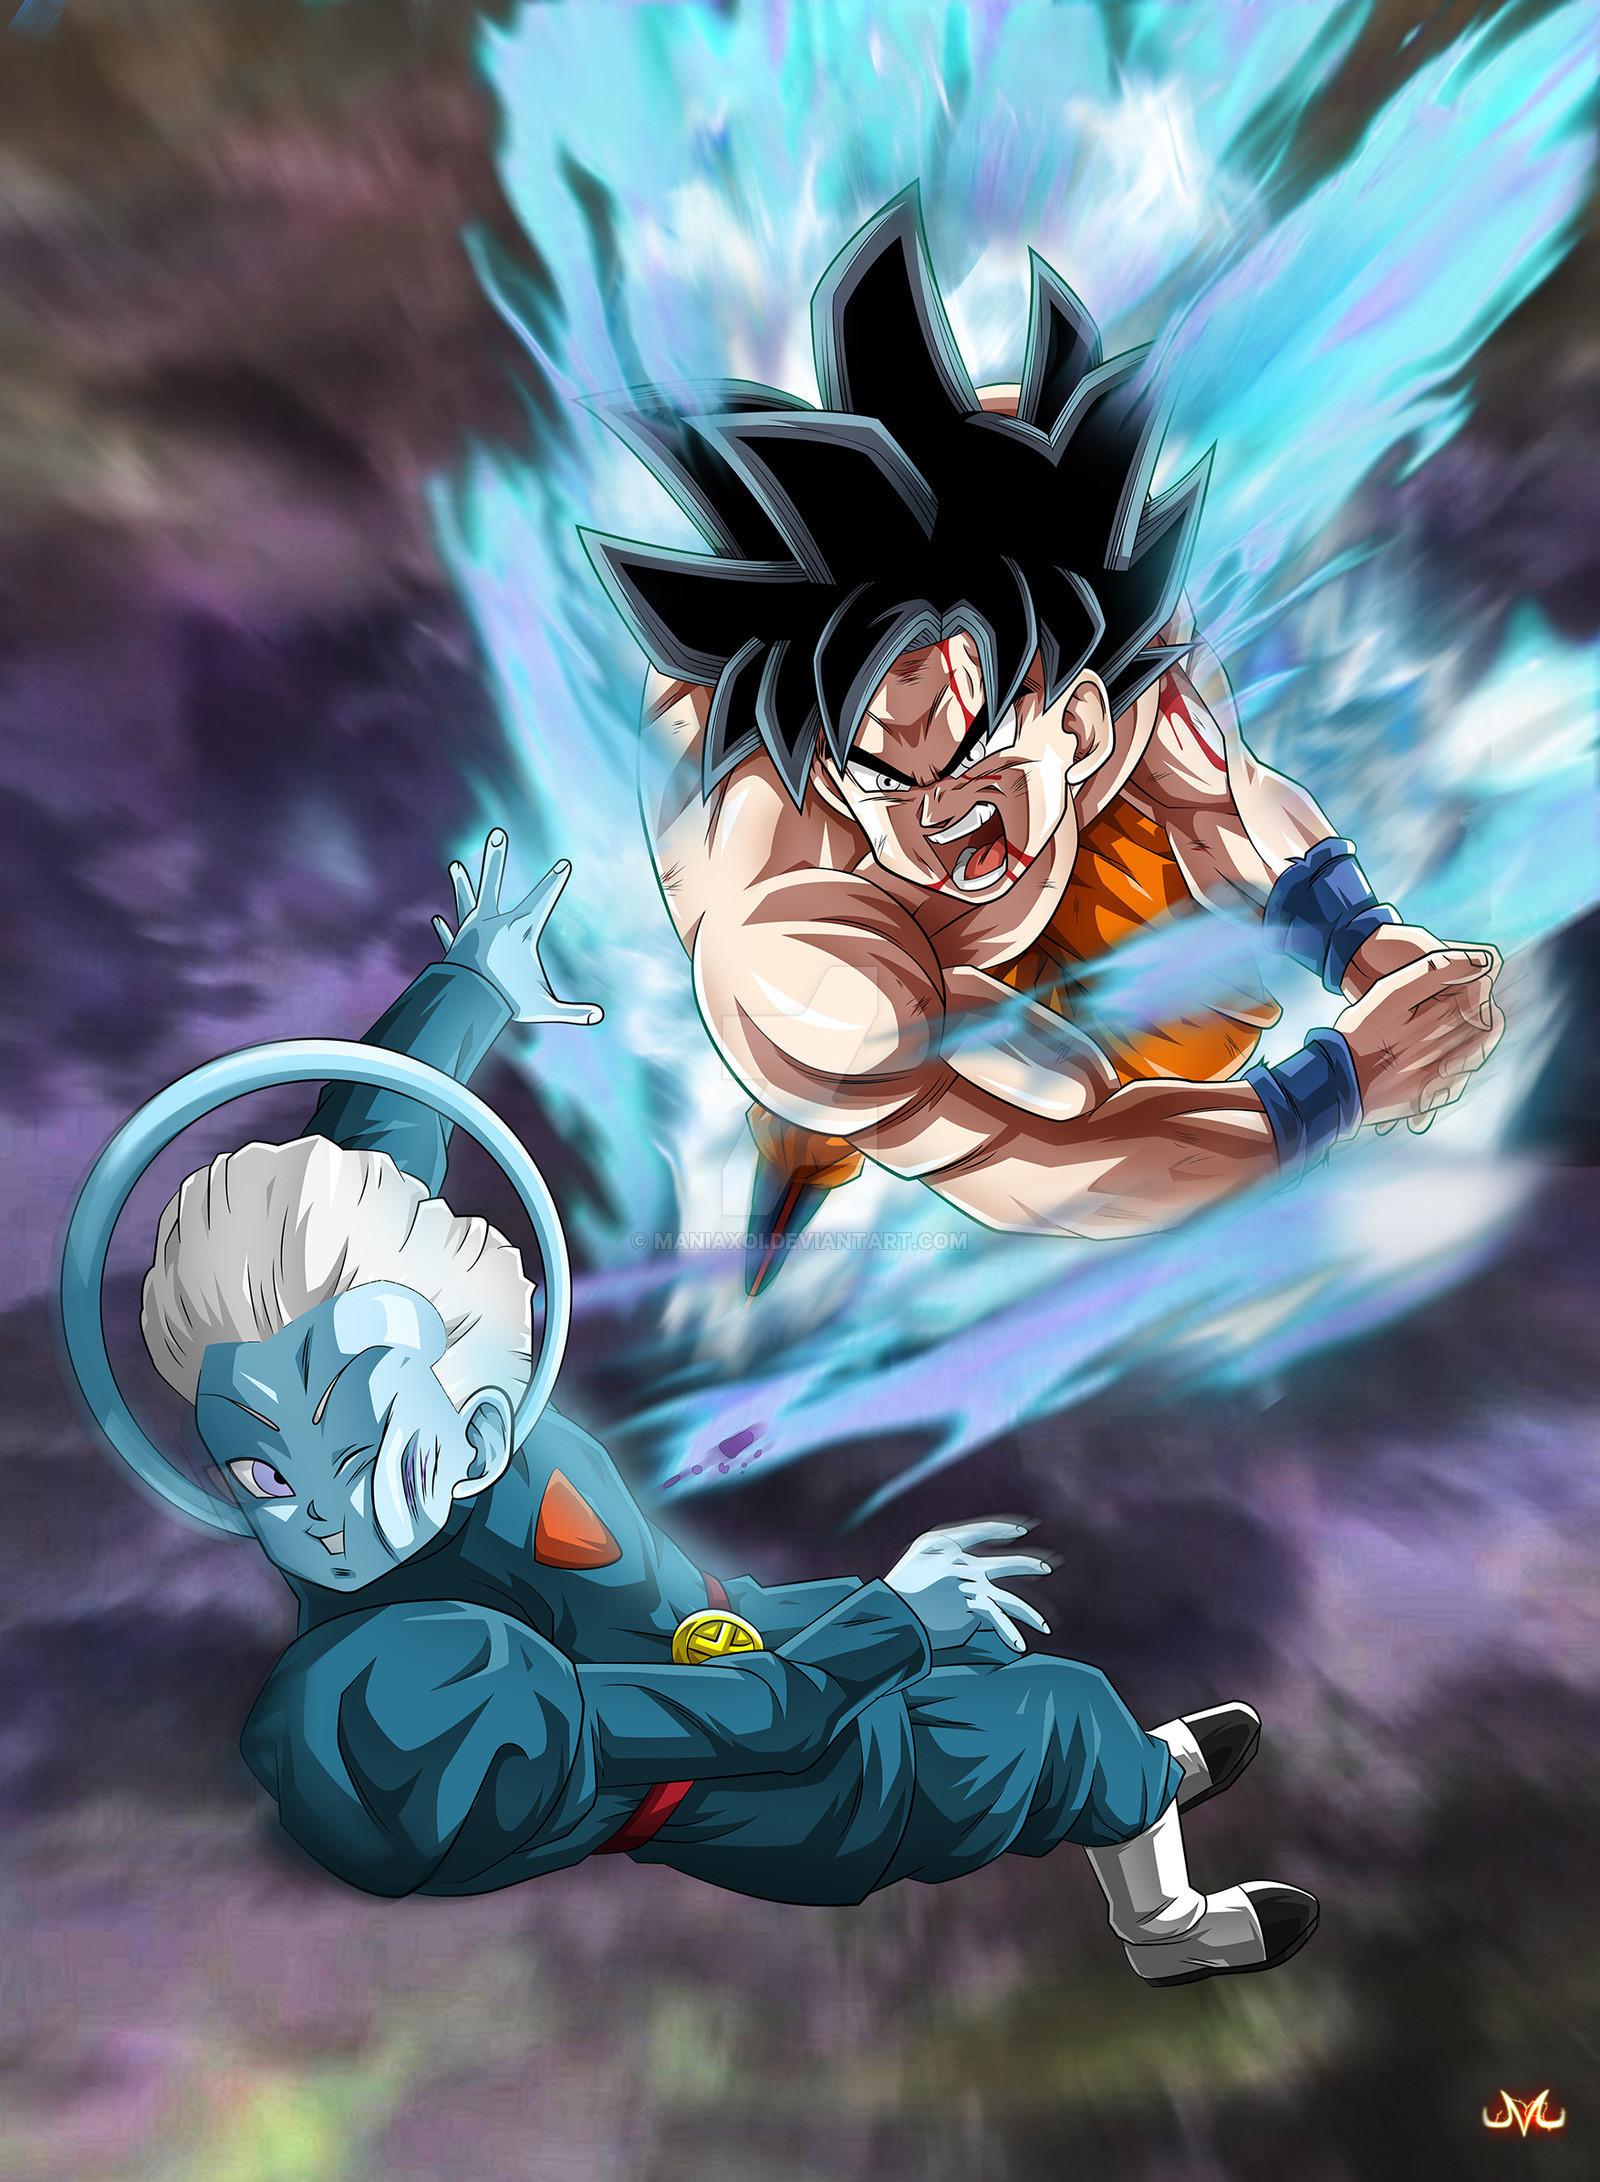 Goku Iphone 6 Wallpaper Gambarku